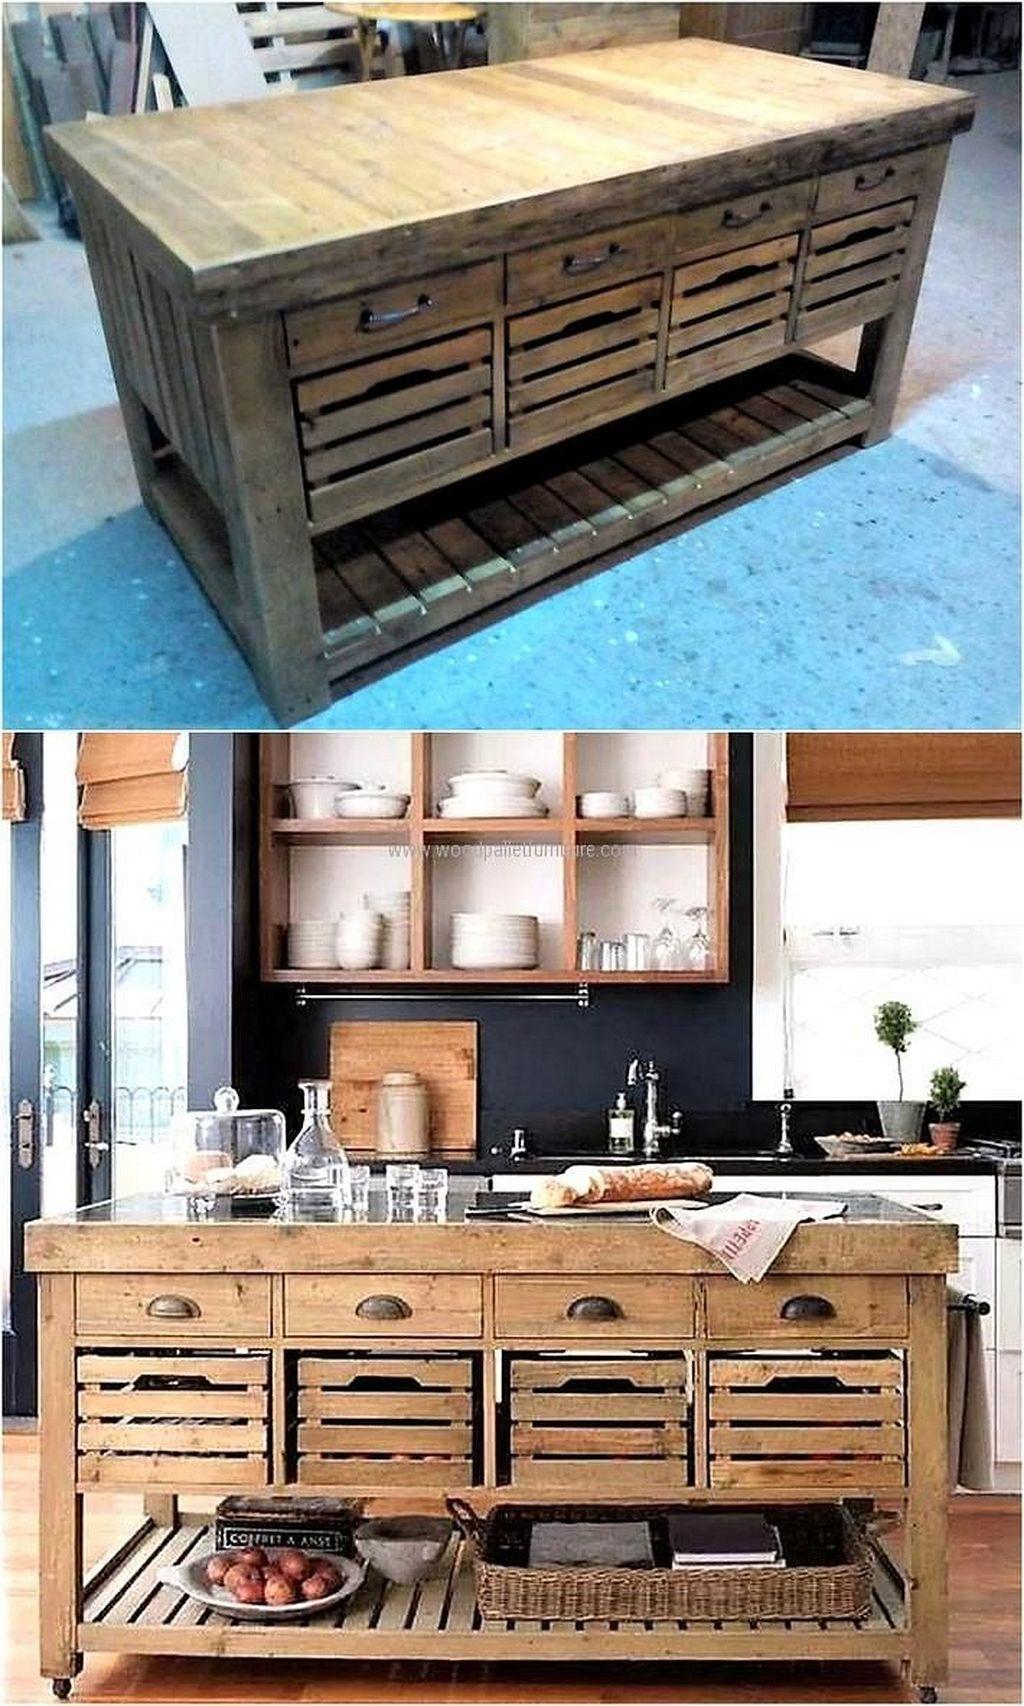 Pin By Derek Miller On Shop Cabinets Pallet Kitchen Cabinets Kitchen Design Diy Wood Pallet Furniture